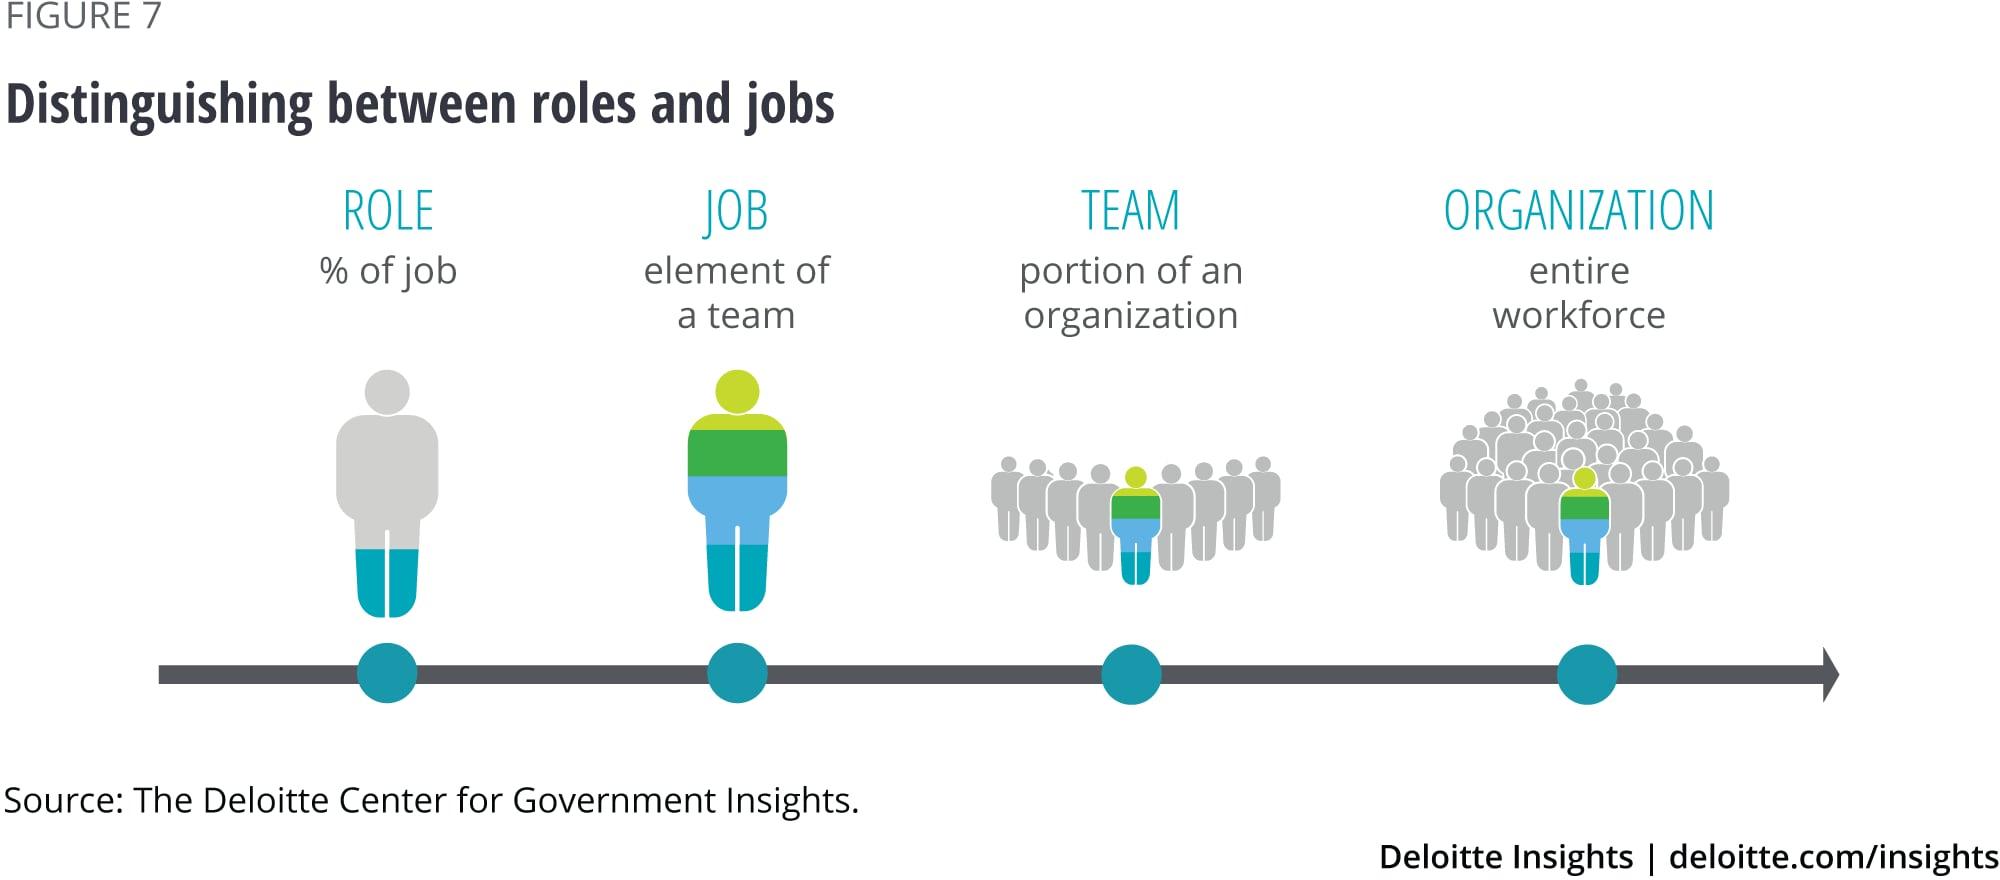 Distinguishing between roles and jobs